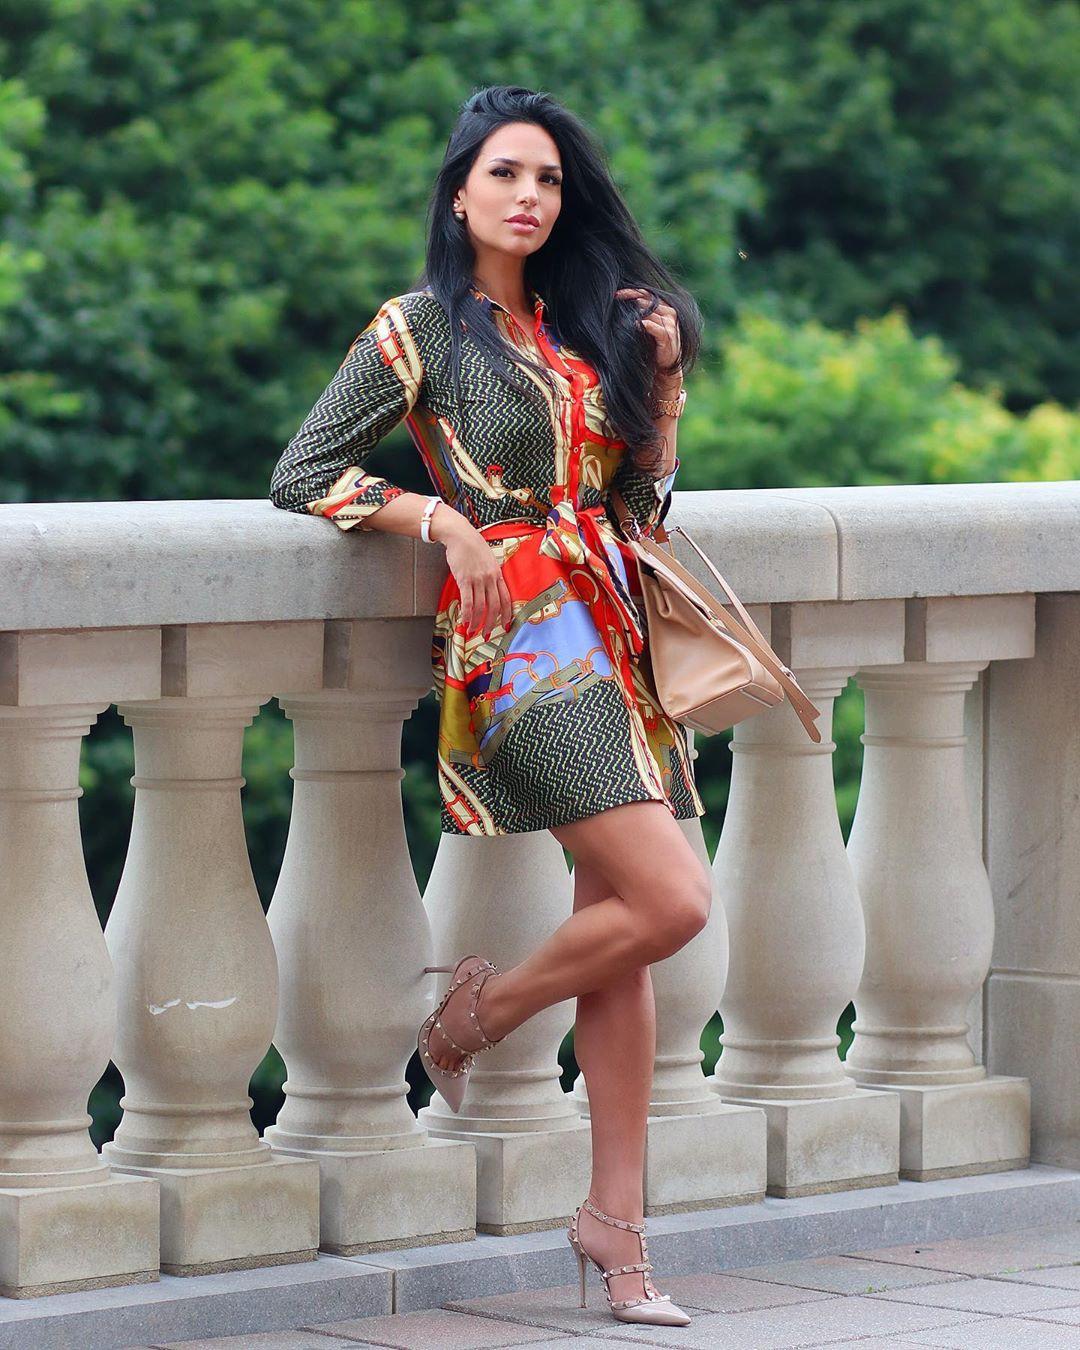 Shadi Y Cair best photoshoot ideas, girls instagram photos, hot legs